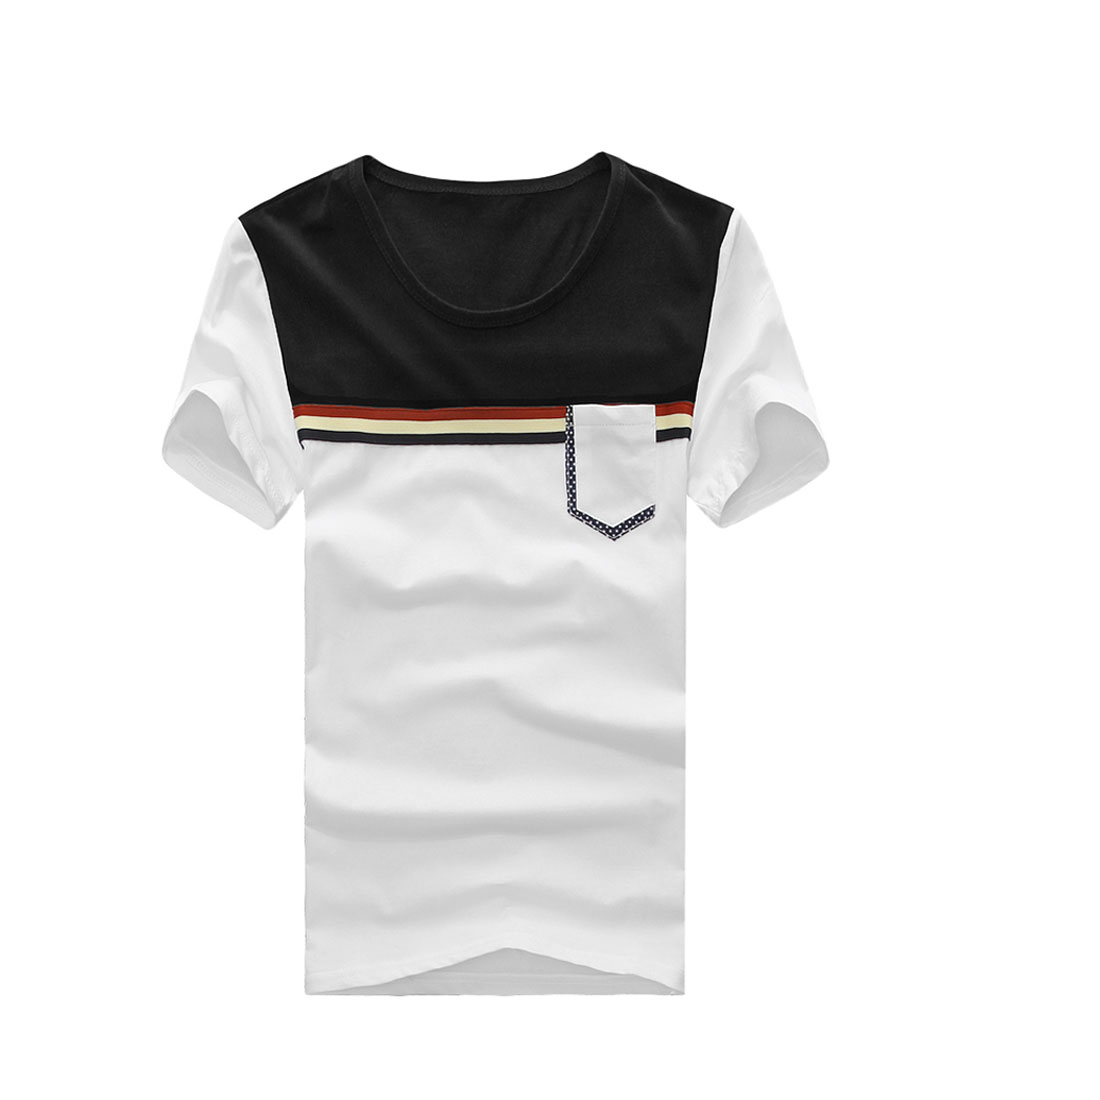 Men Round Neck Short Sleeve Color Block T-shirt Black White S